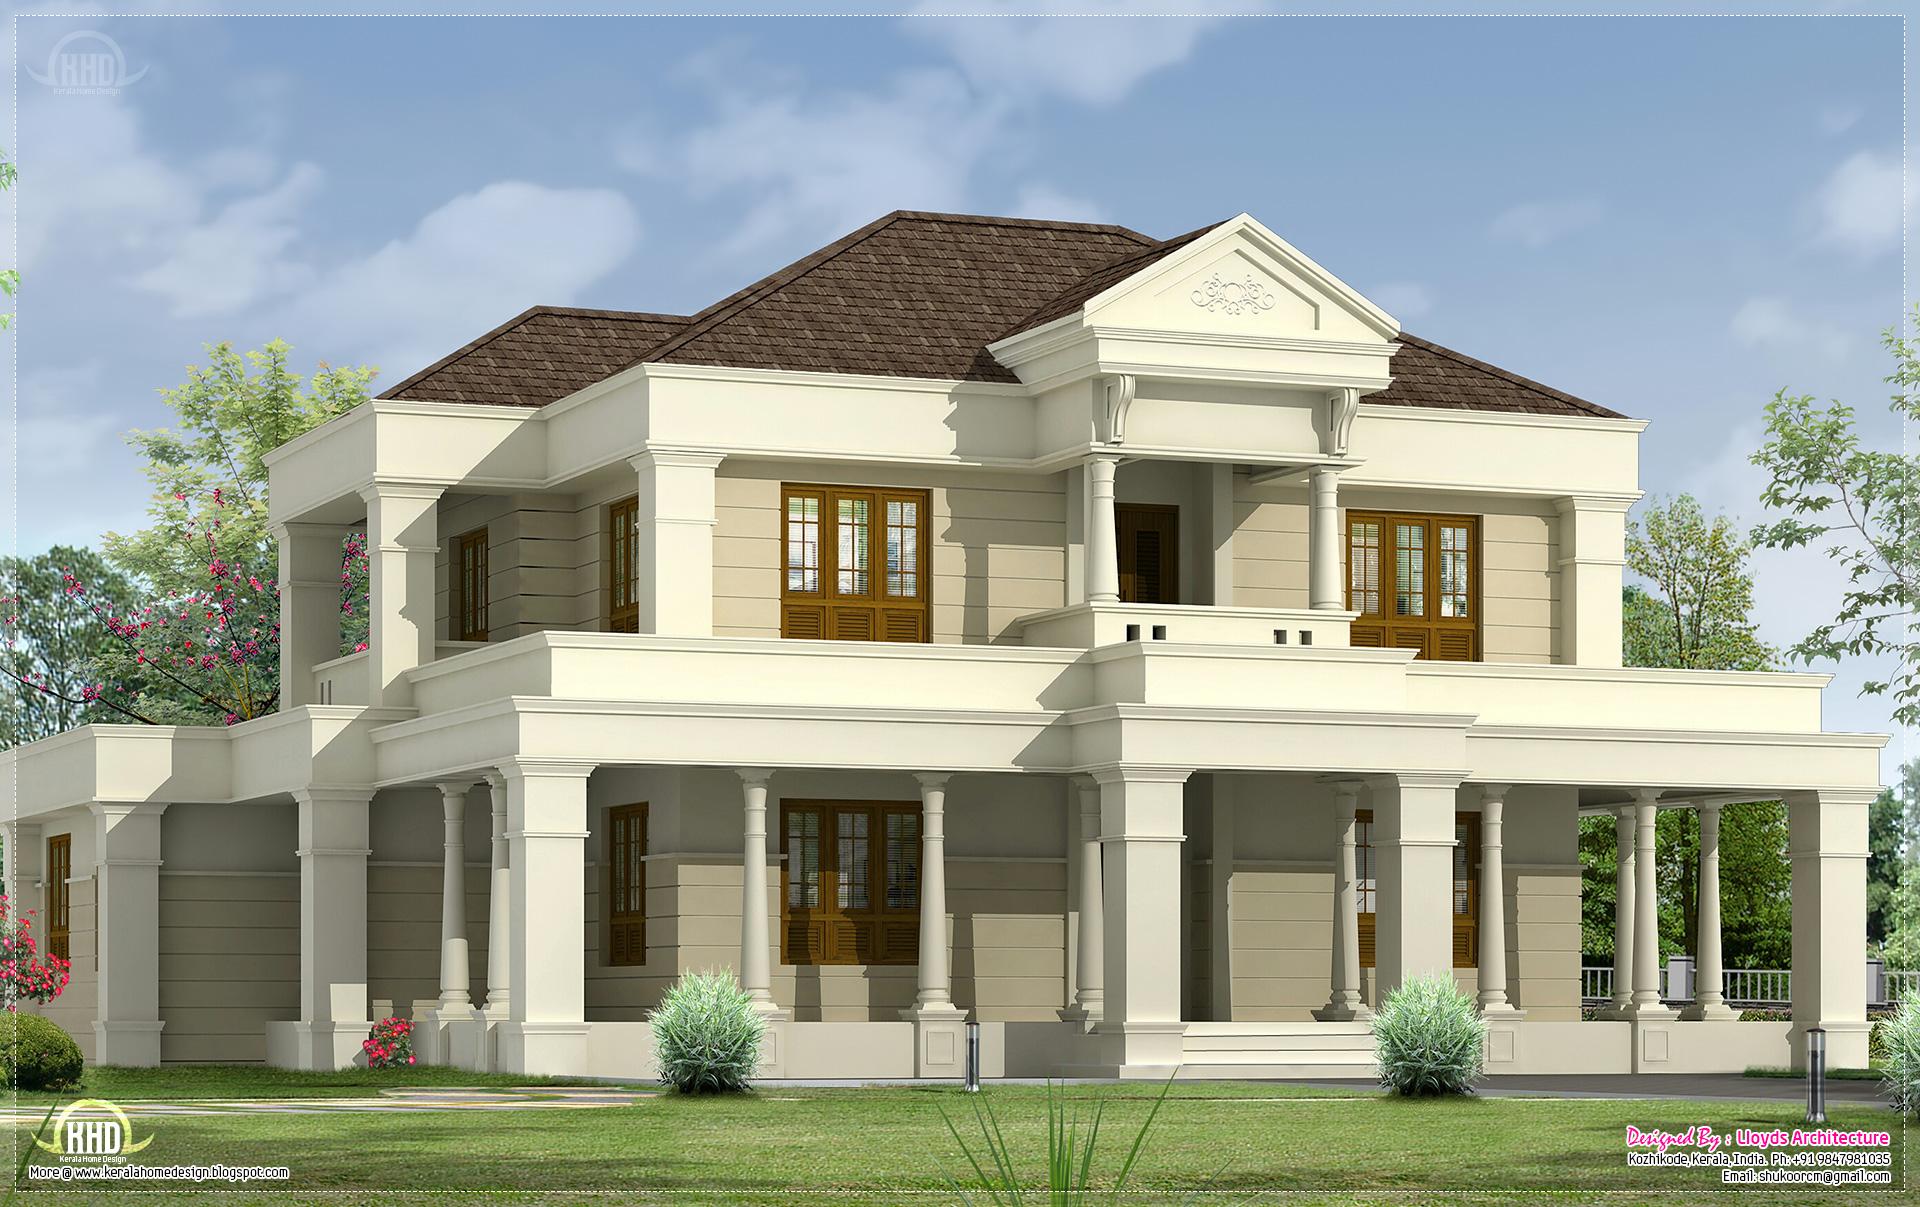 Exterior: 5 Bedroom Luxurious Villa Exterior Design